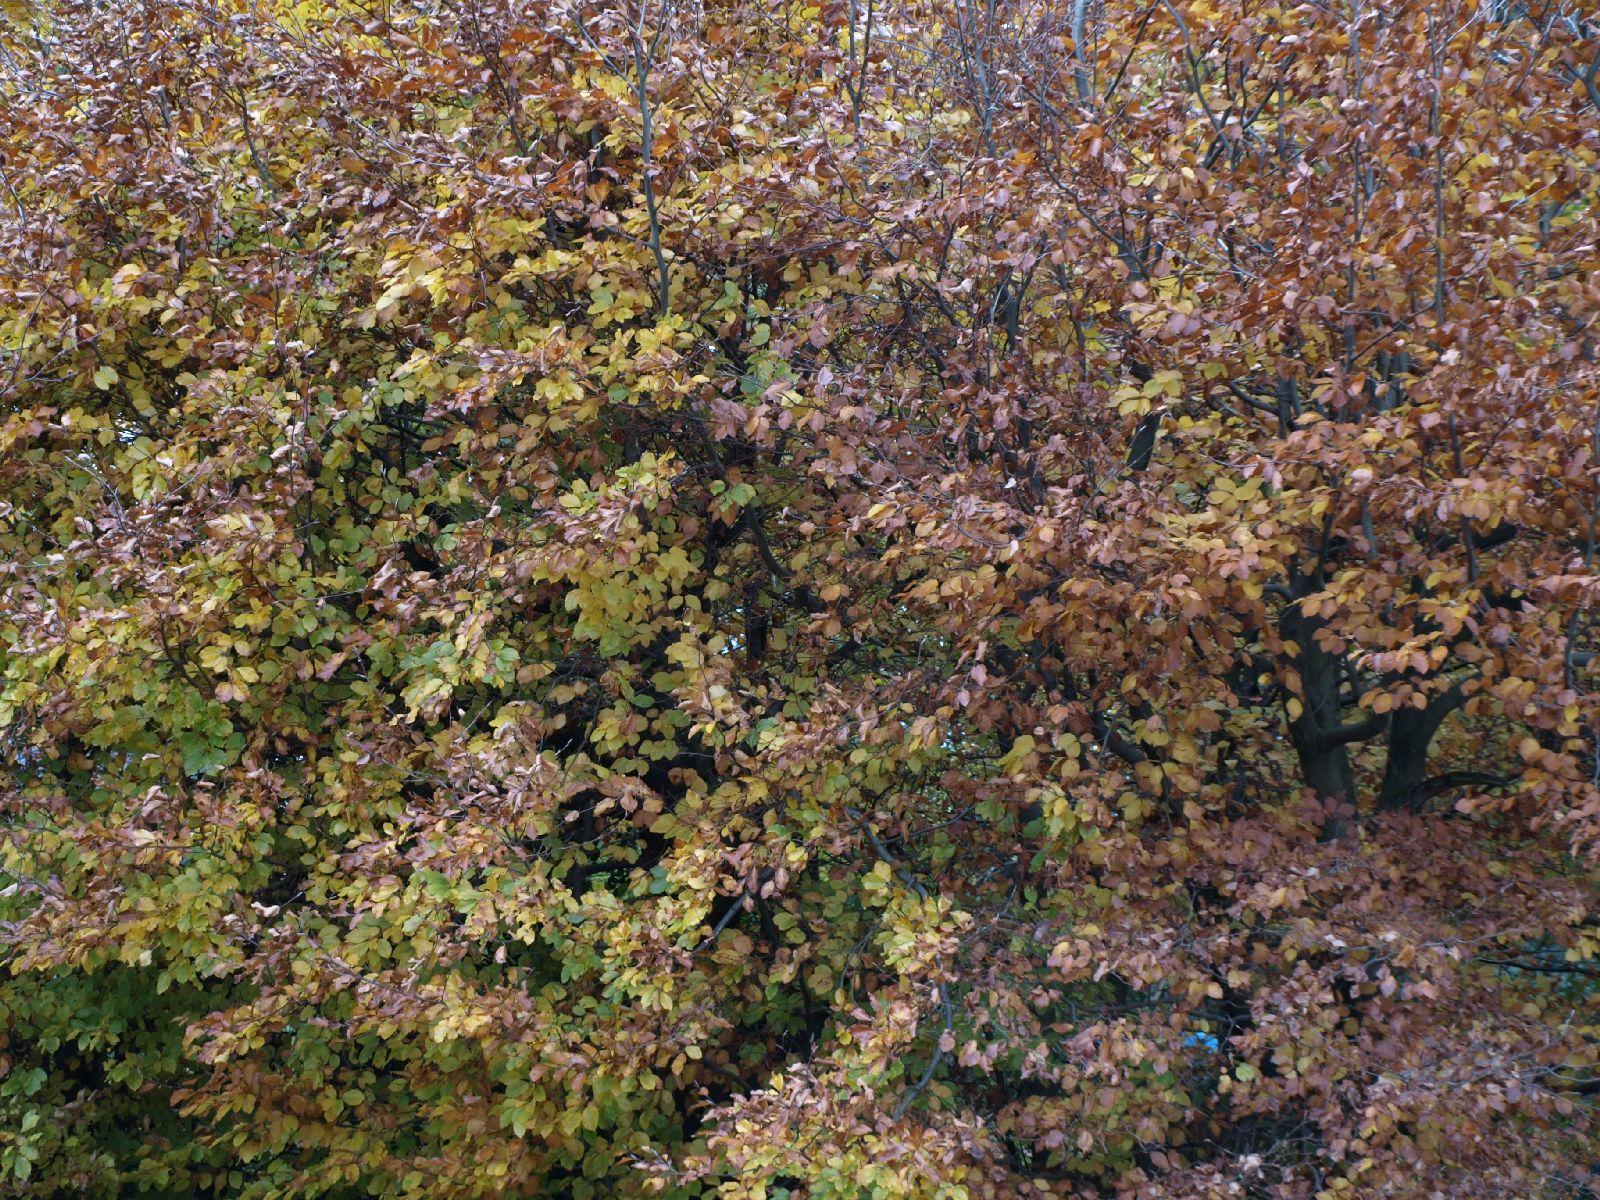 Plants-Trees_Photo_Texture_B_PB026432